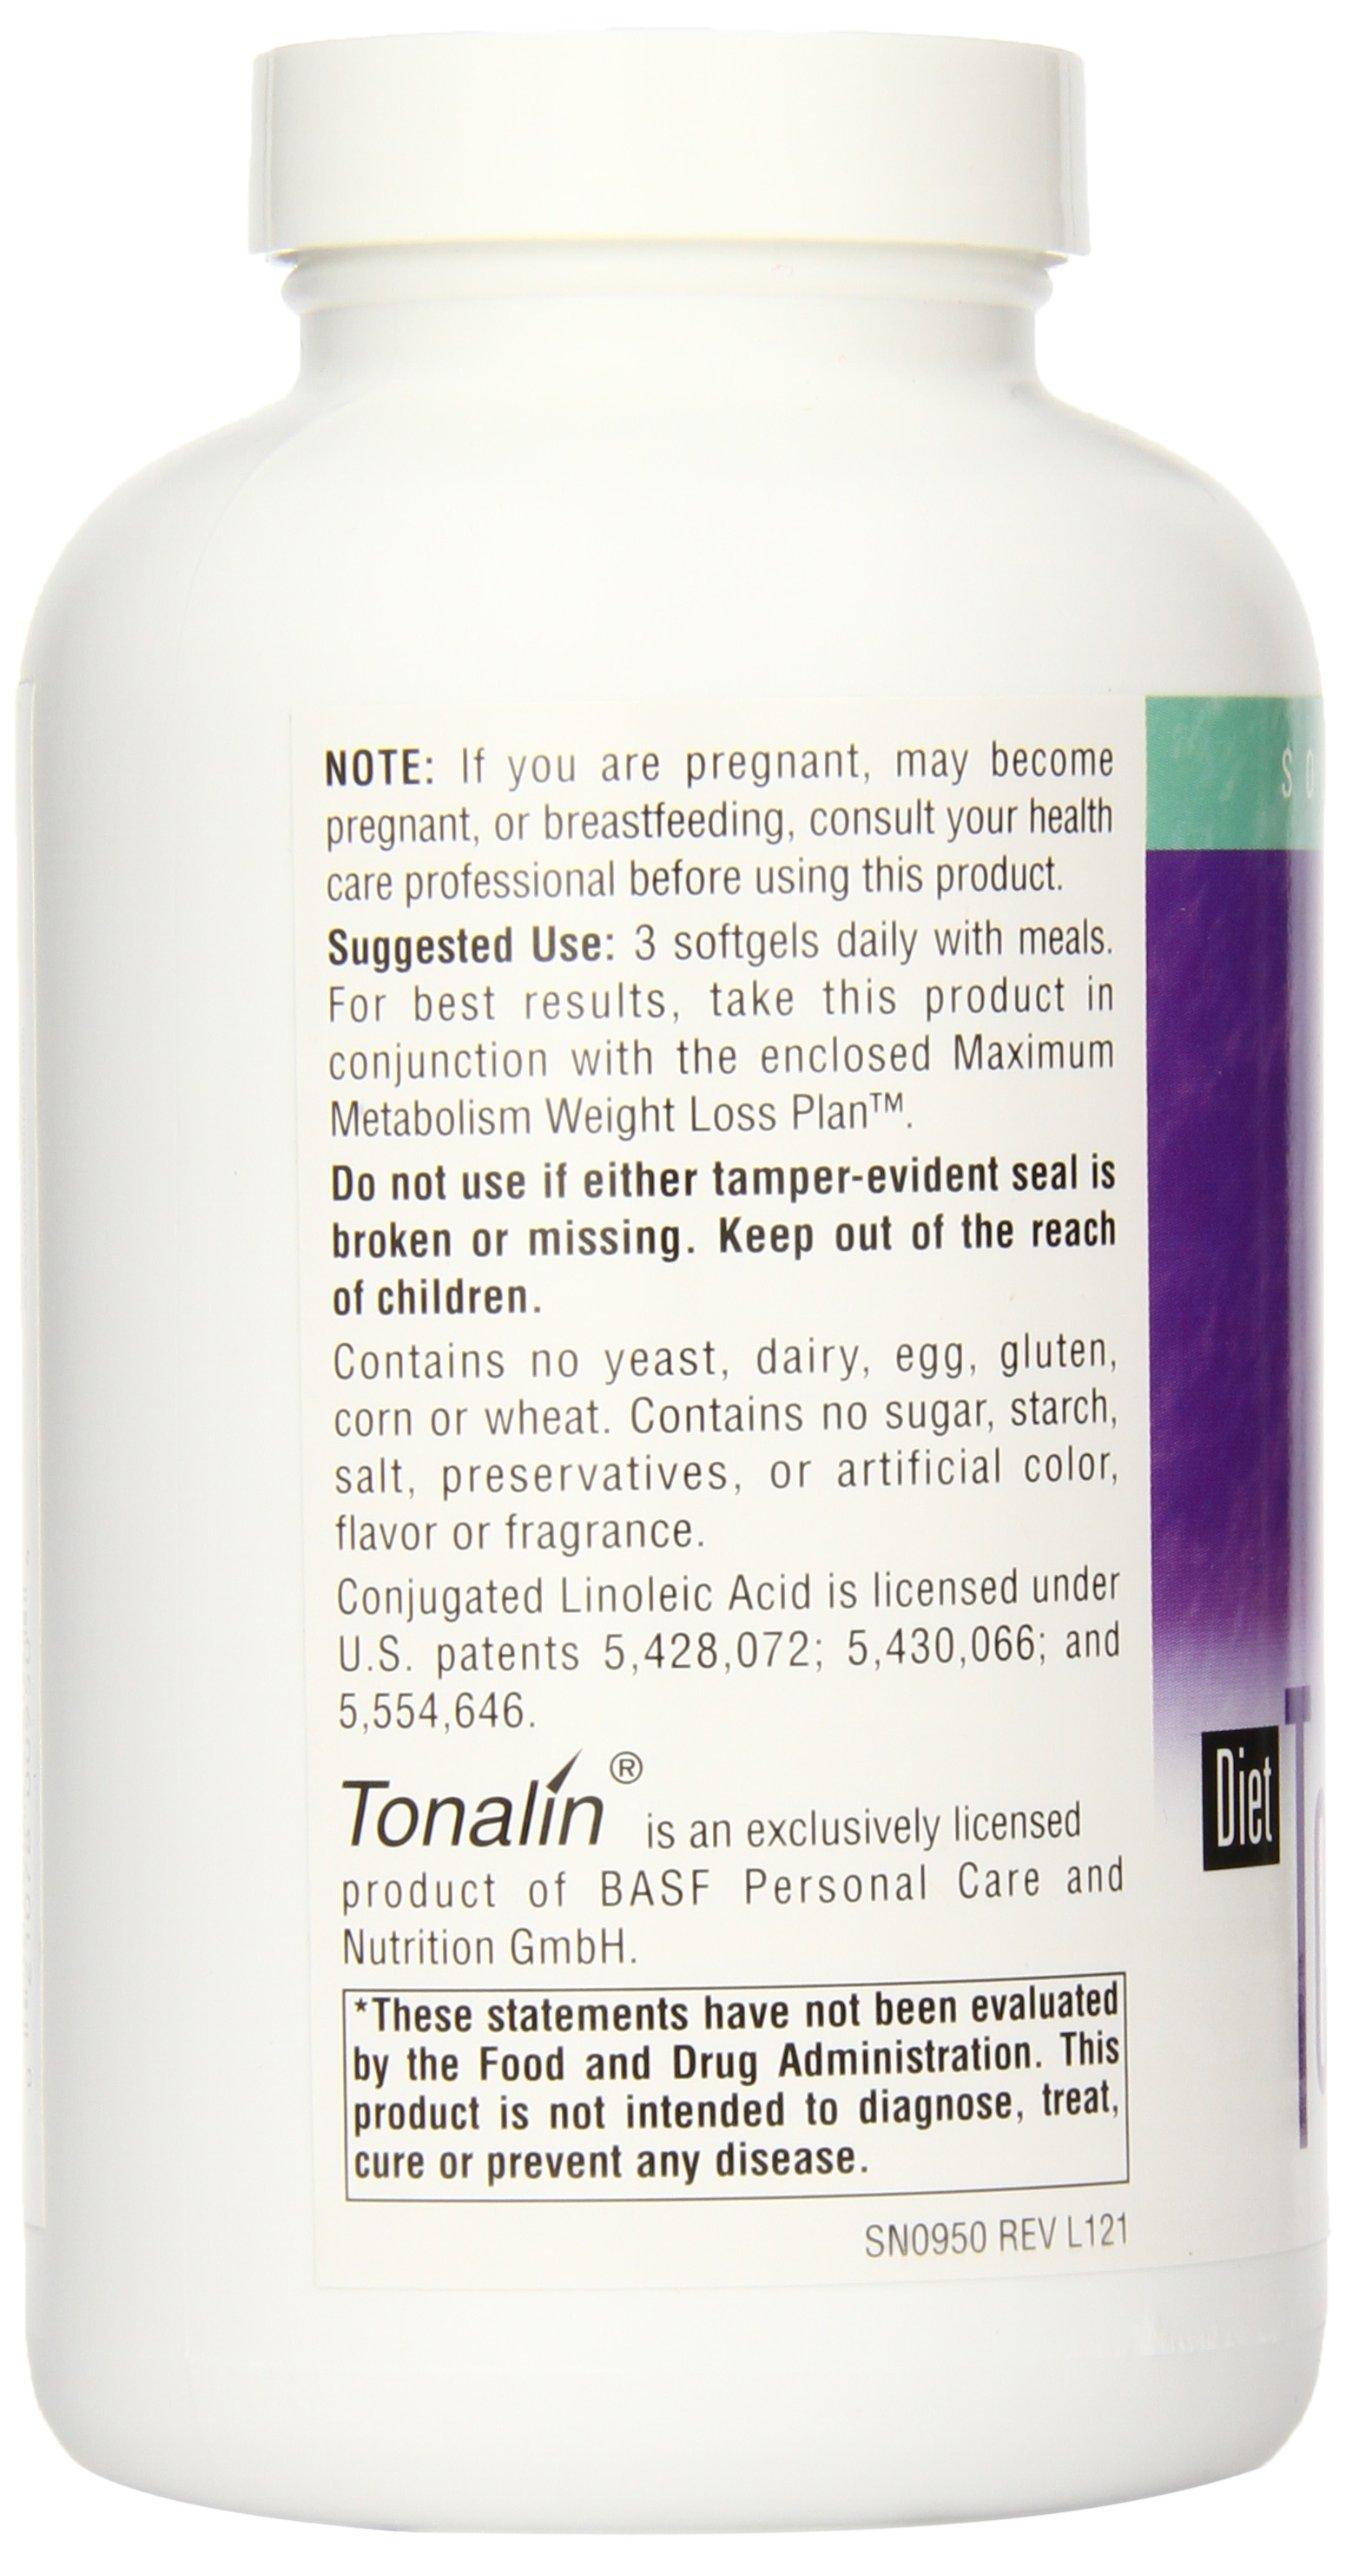 Source Naturals Diet Tonalin CLA, May Help Reduce Body Fat, 120 Softgels